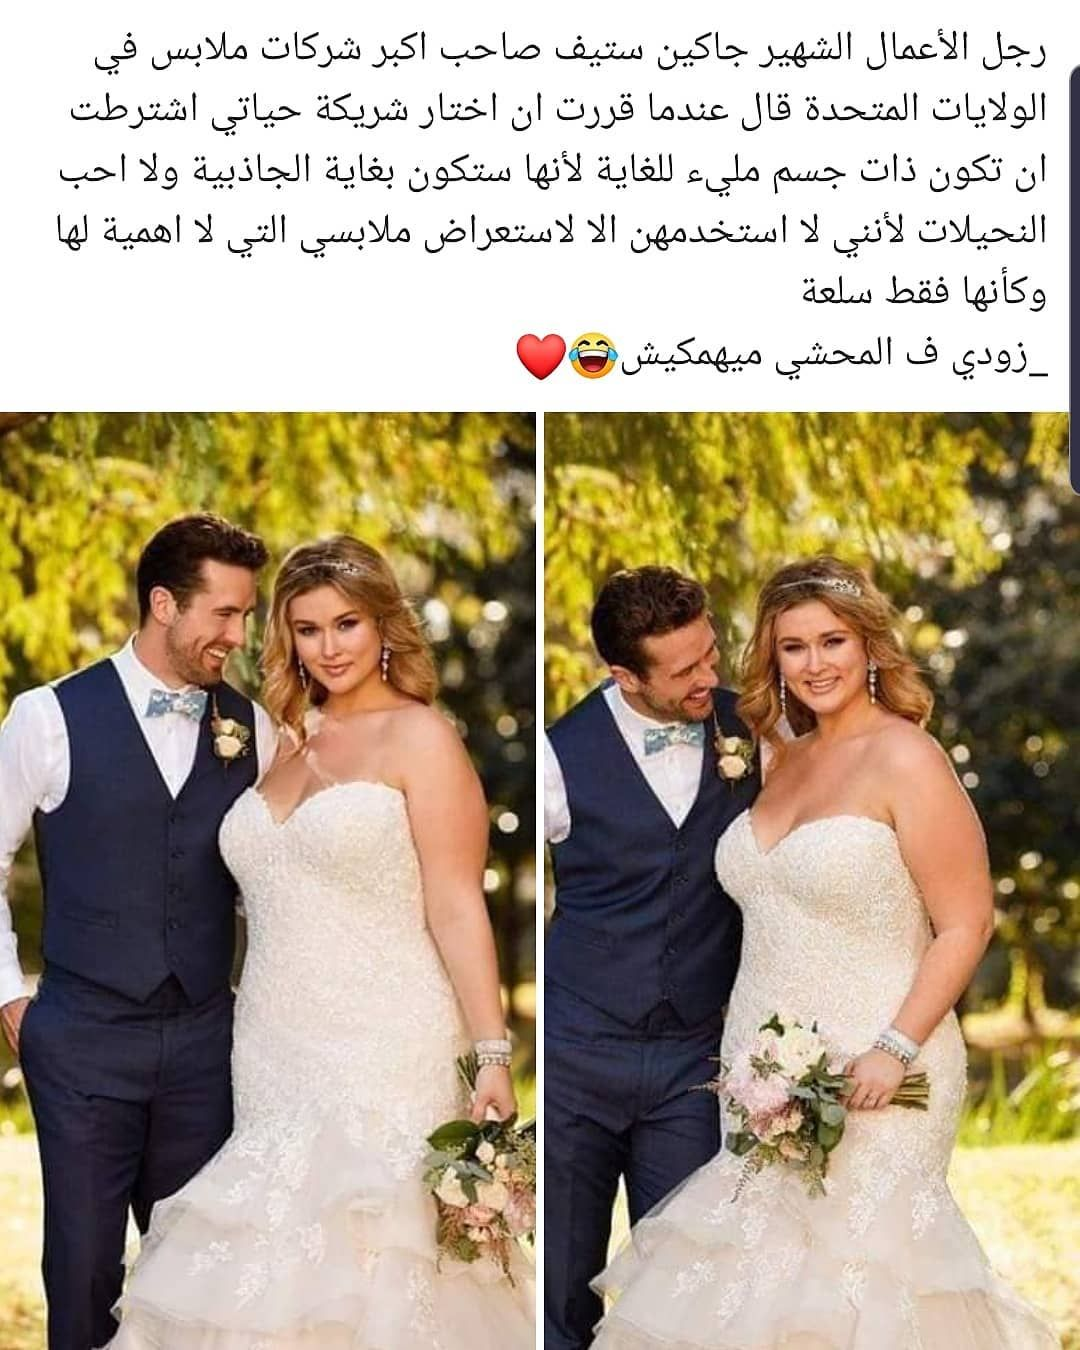 Publication Instagram Par أم زين Emm Zein 17 Juil 2019 A 9 17 Utc Funny Arabic Quotes Arabic Funny Strapless Dress Formal